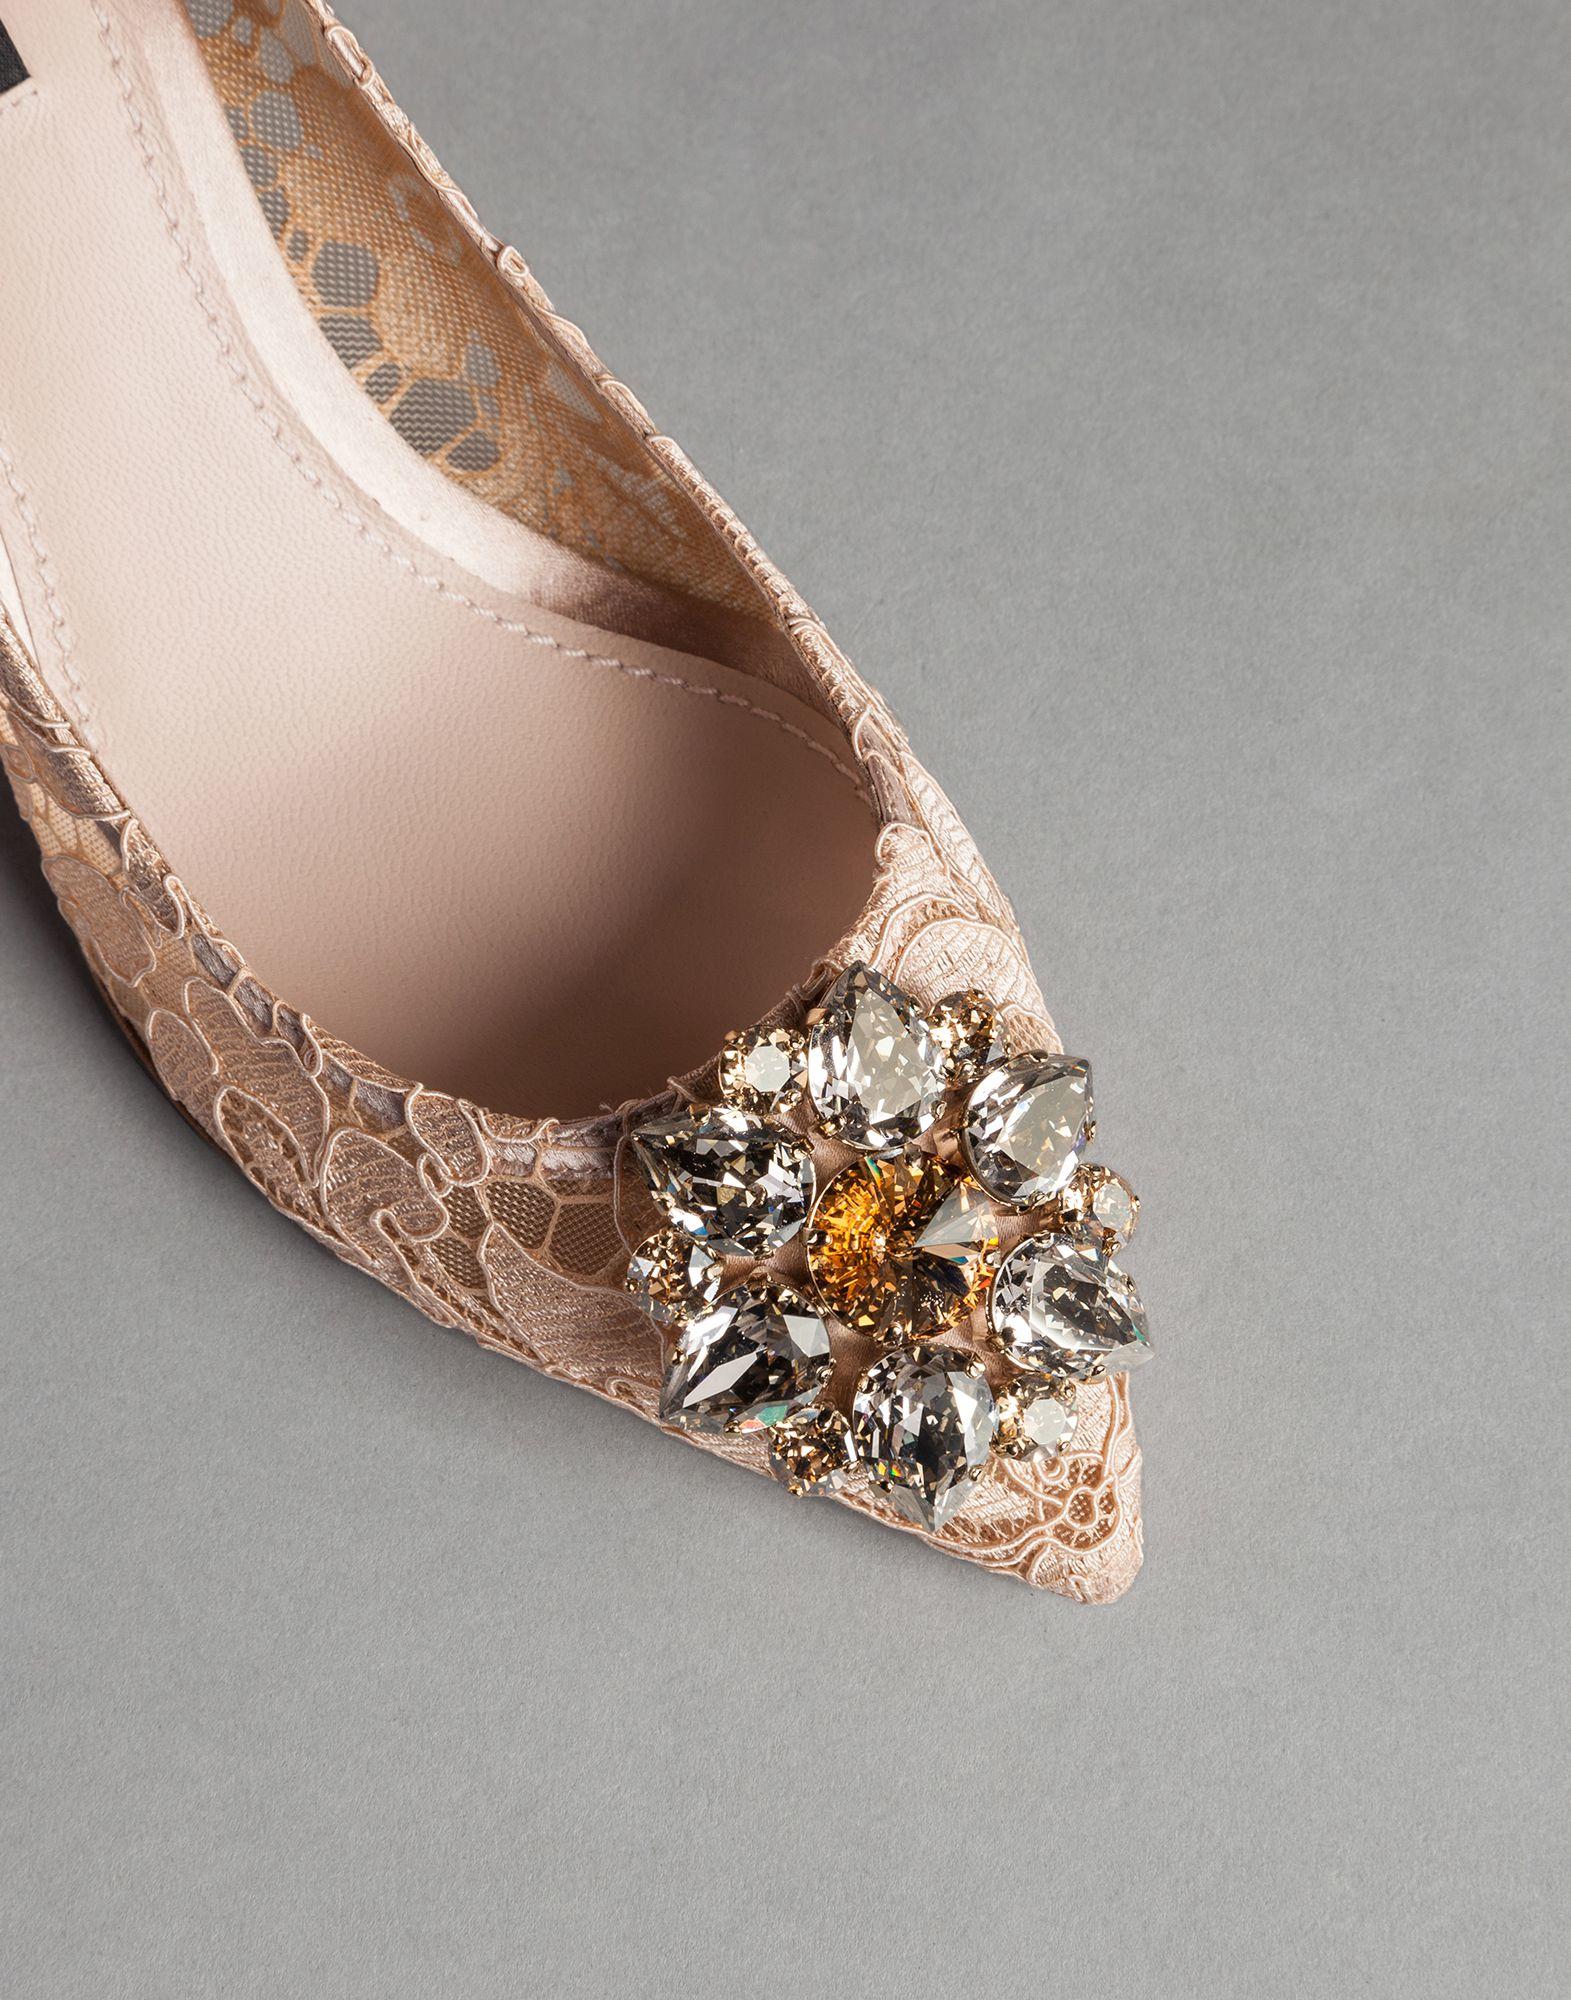 b9075cc79ac9 Lyst - Dolce   Gabbana Bellucci Embellished Lace Pumps in Natural